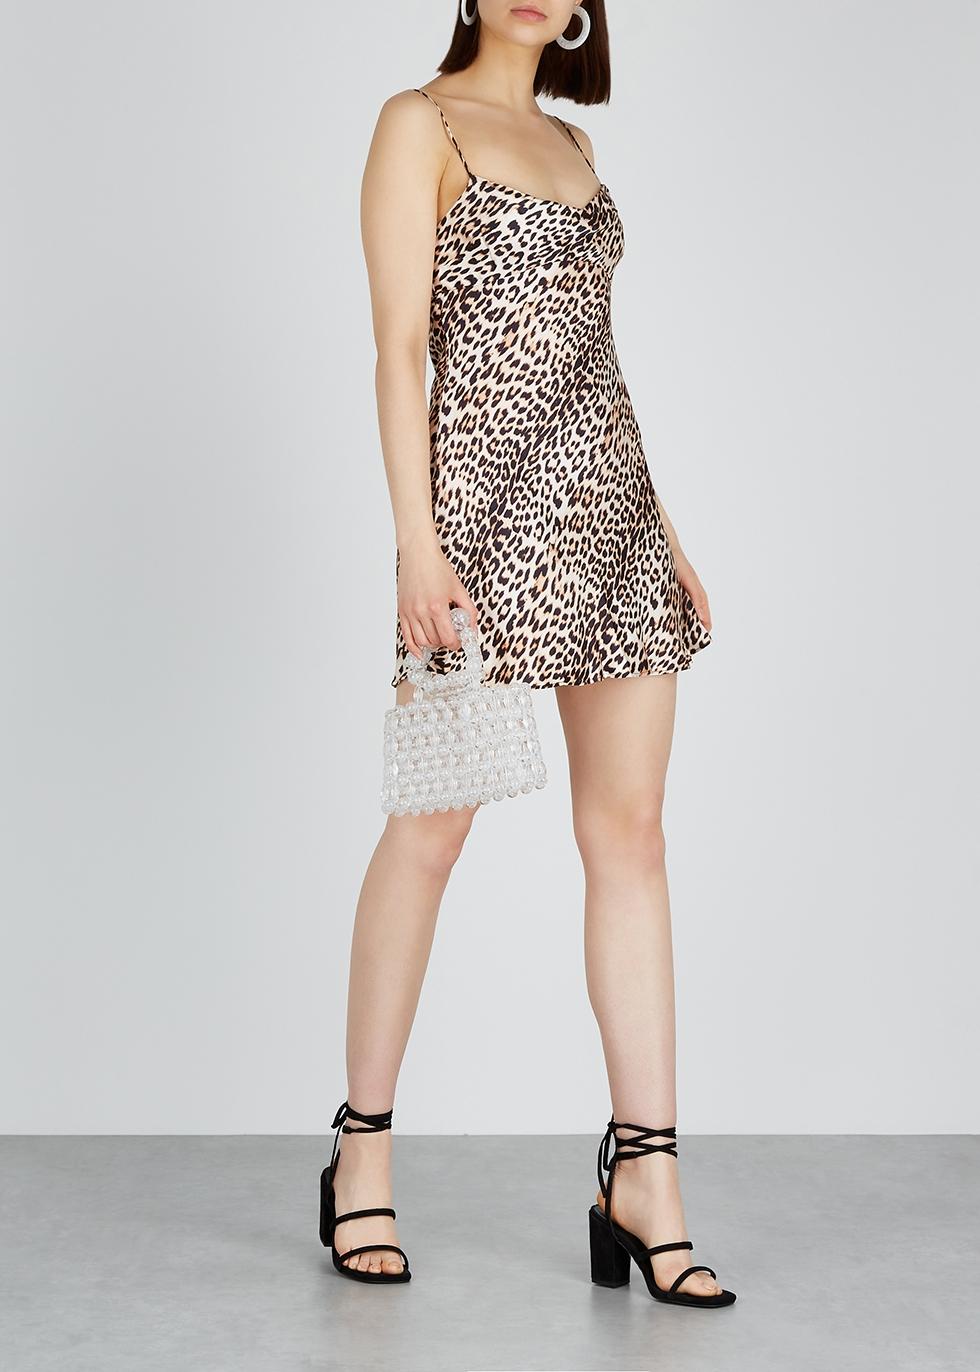 Feline leopard-print silk mini dress - Bec & Bridge